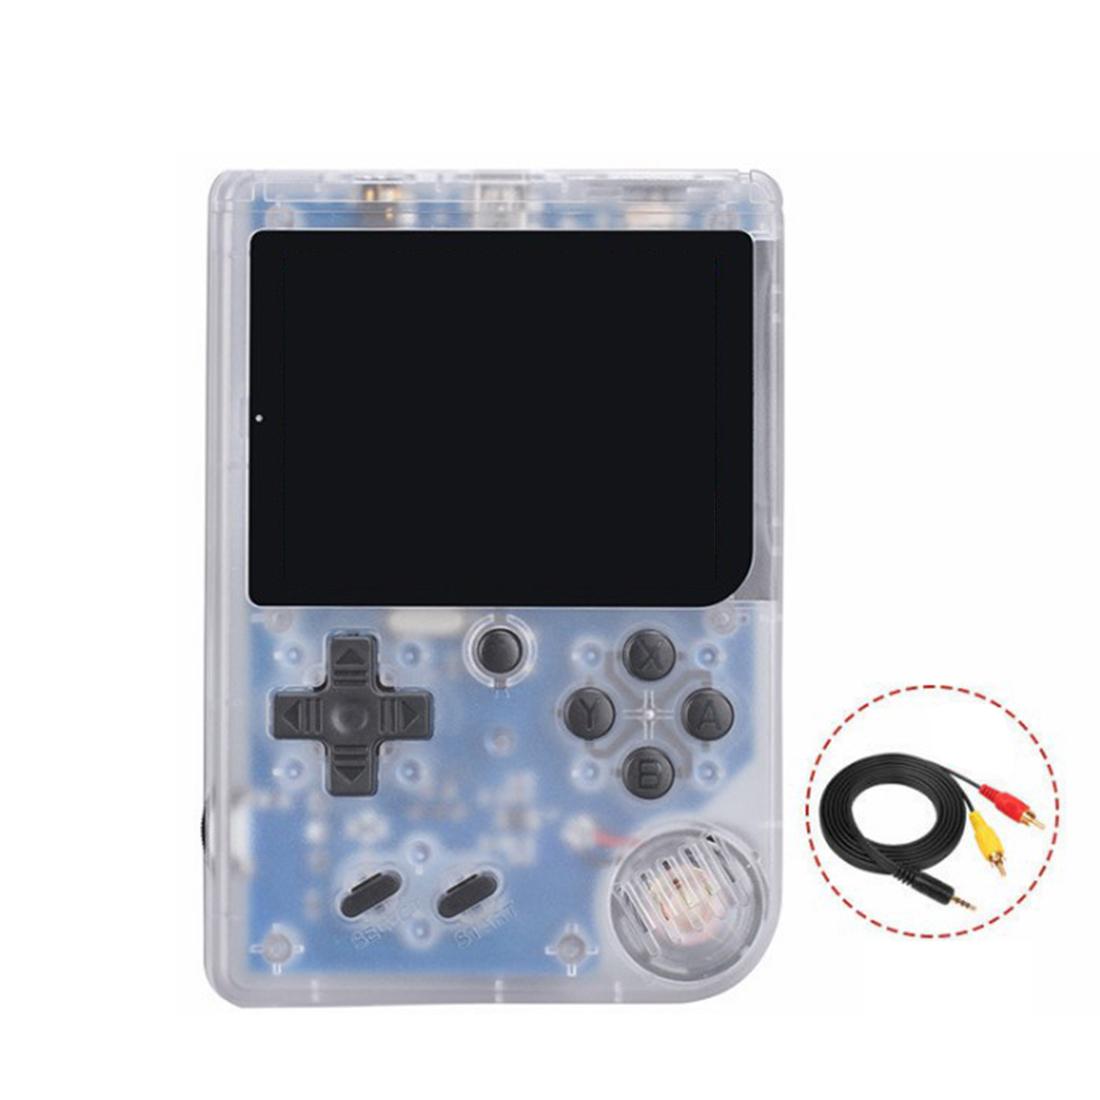 Powkiddy X16 Q3A Handheld 168 Games Console FC Games Mini Arcade Machine